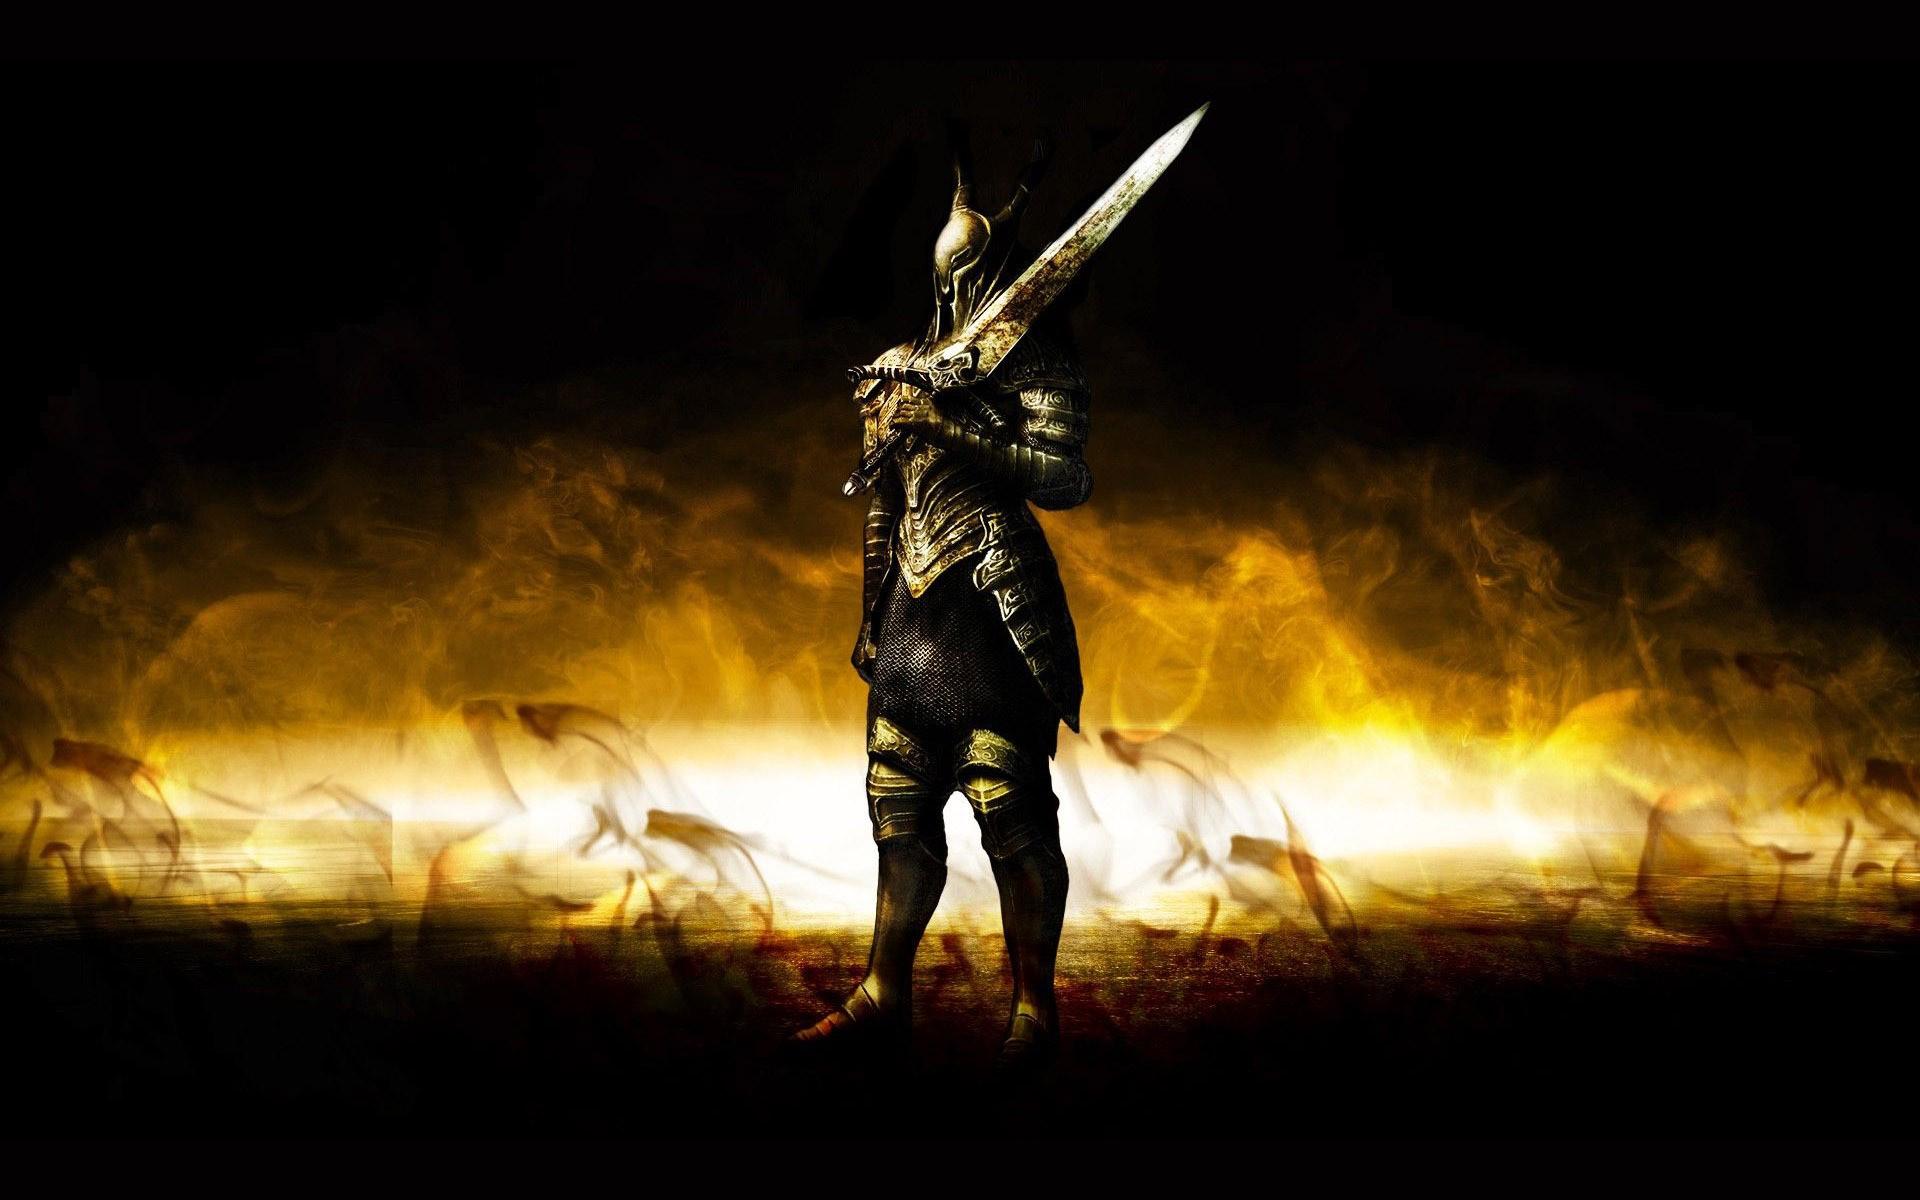 Dark Souls Bonfire Wallpaper Download Free Amazing High